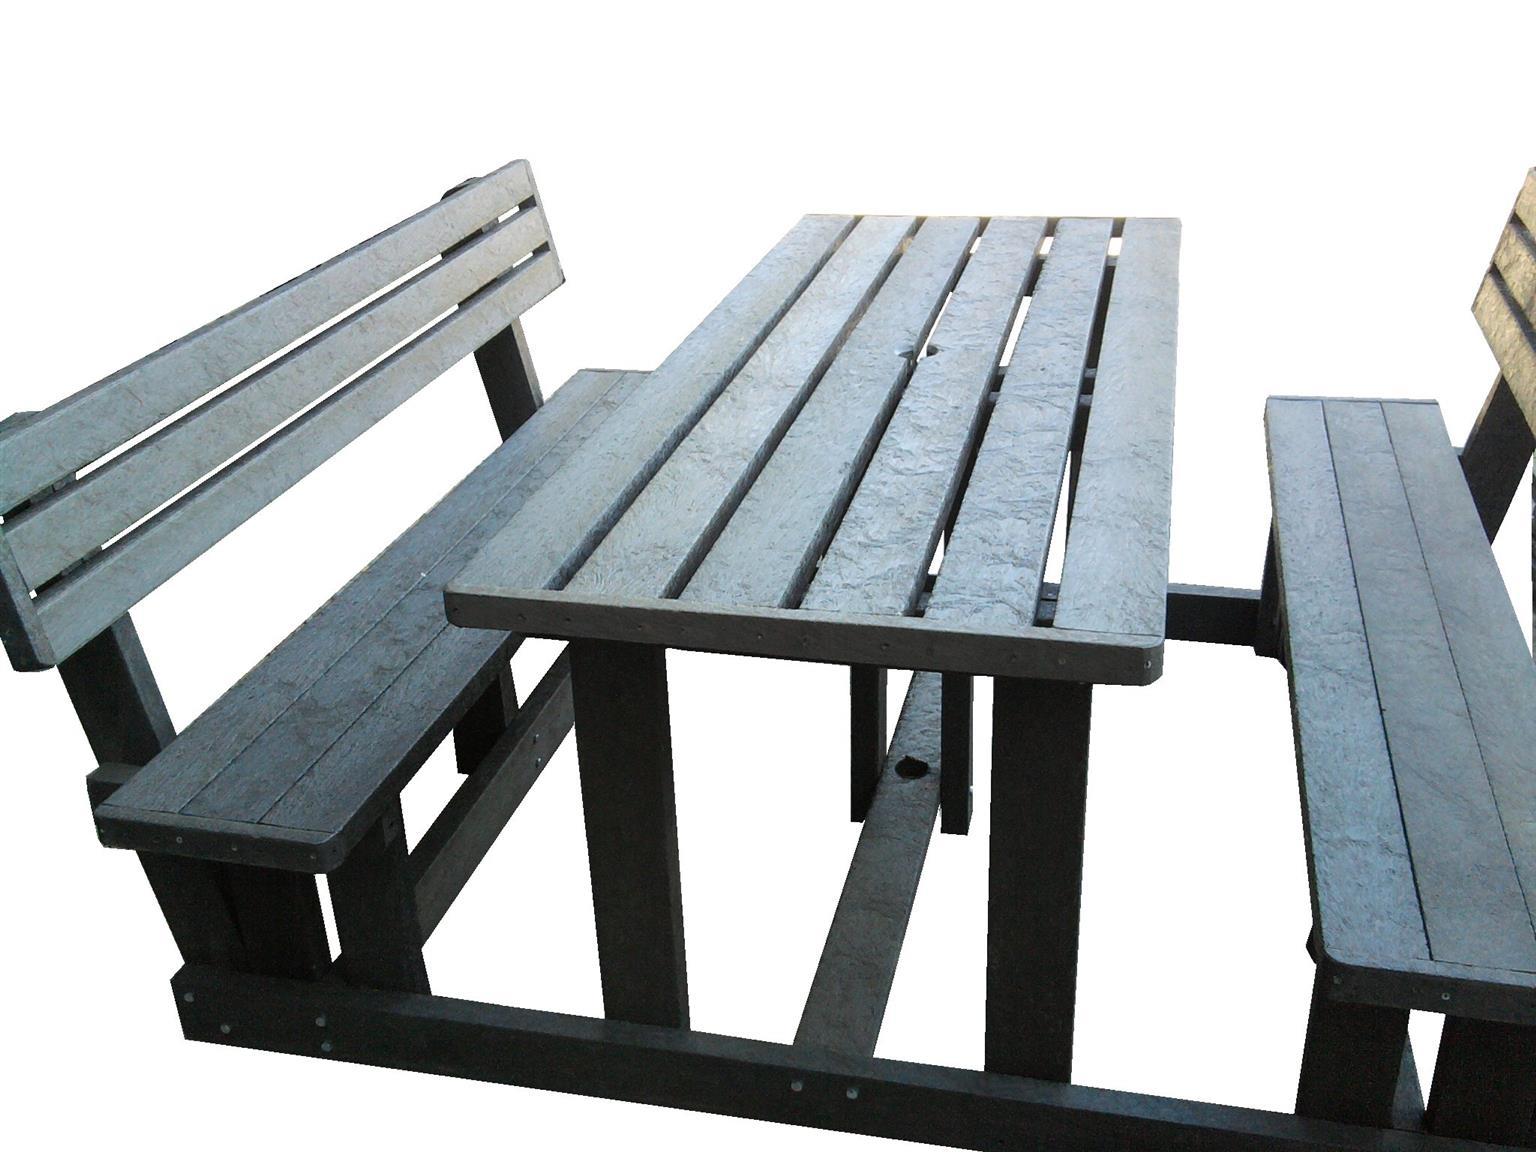 Patio Furniture and Plastic Outdoor Furniture